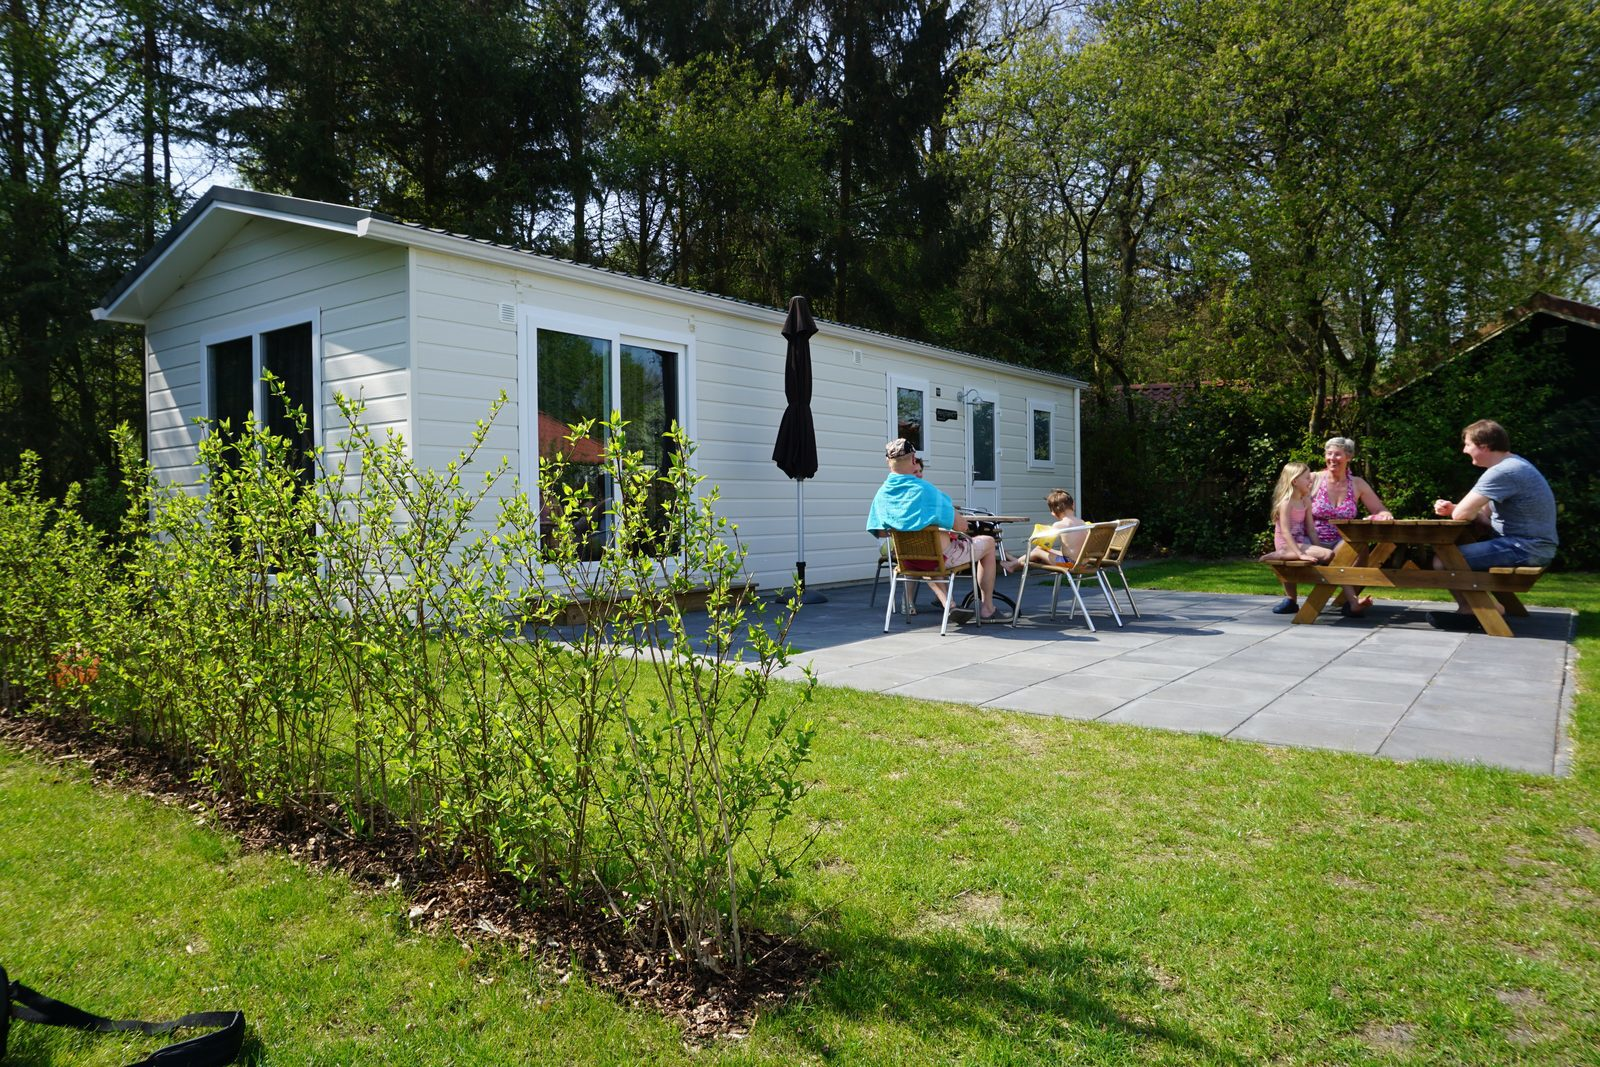 Chalet huren camping Nederland